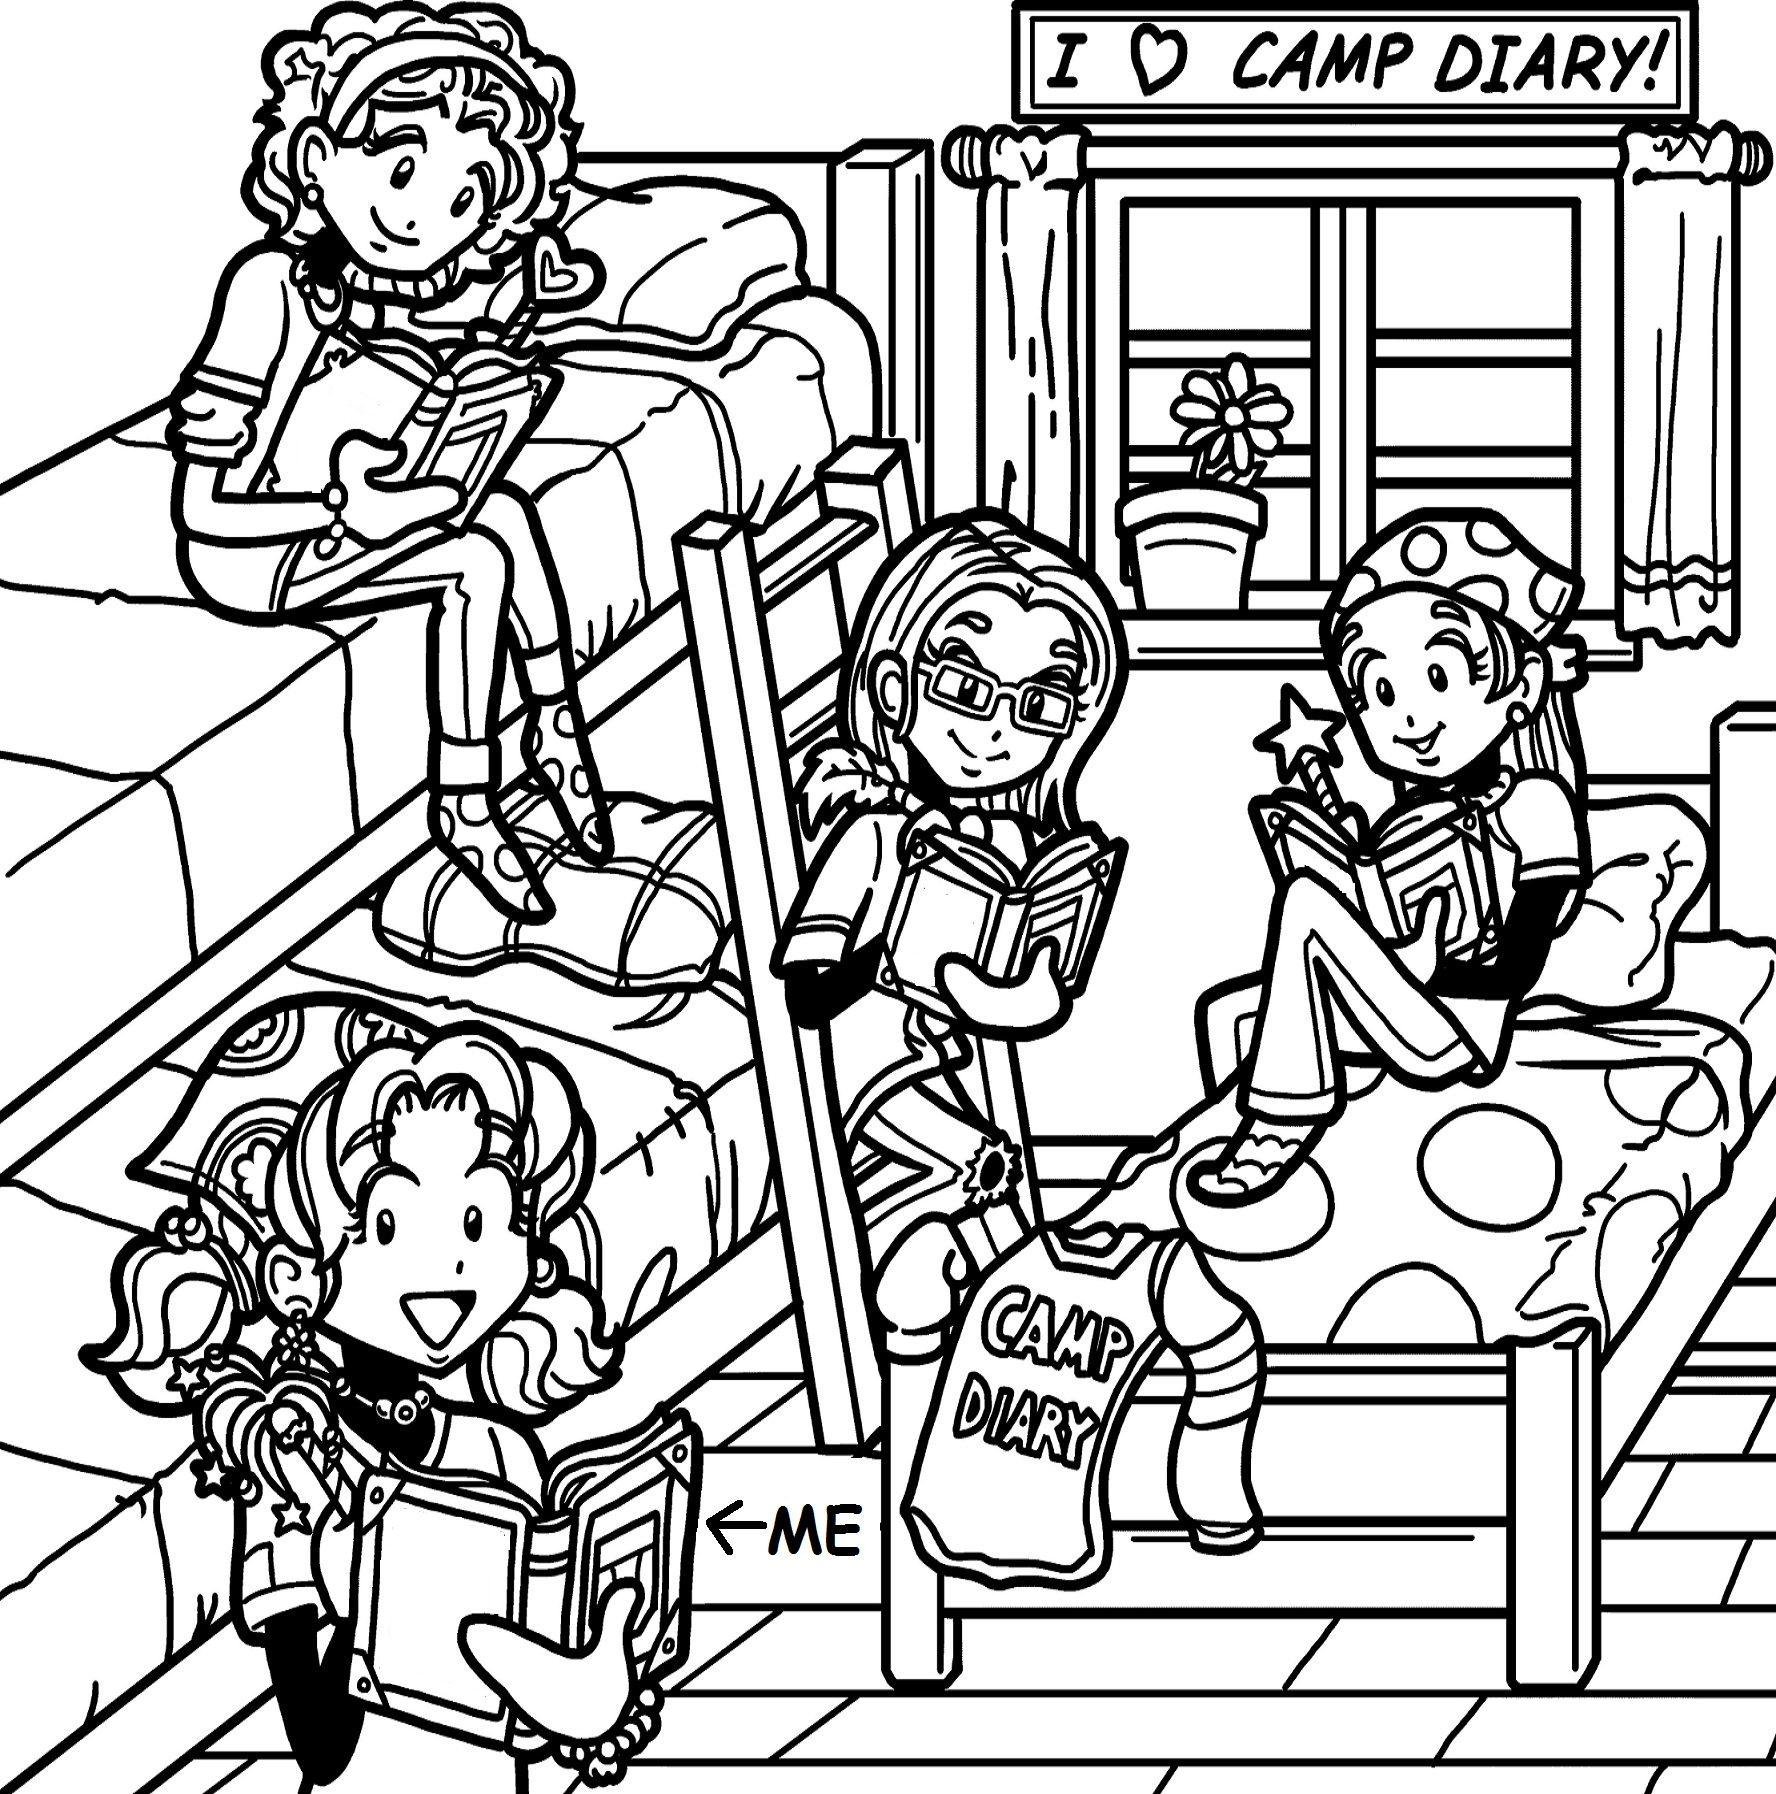 Nikki's Camp Diary